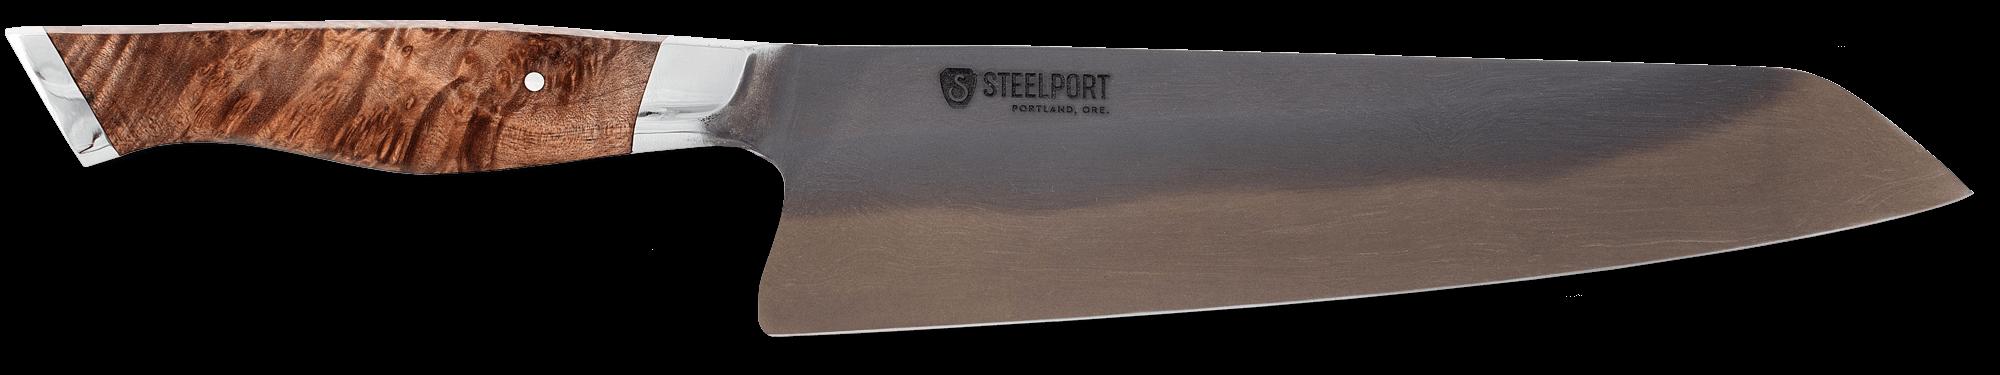 "STEELPORT Knife Co. 8"" Carbon Steel Chef Knife"